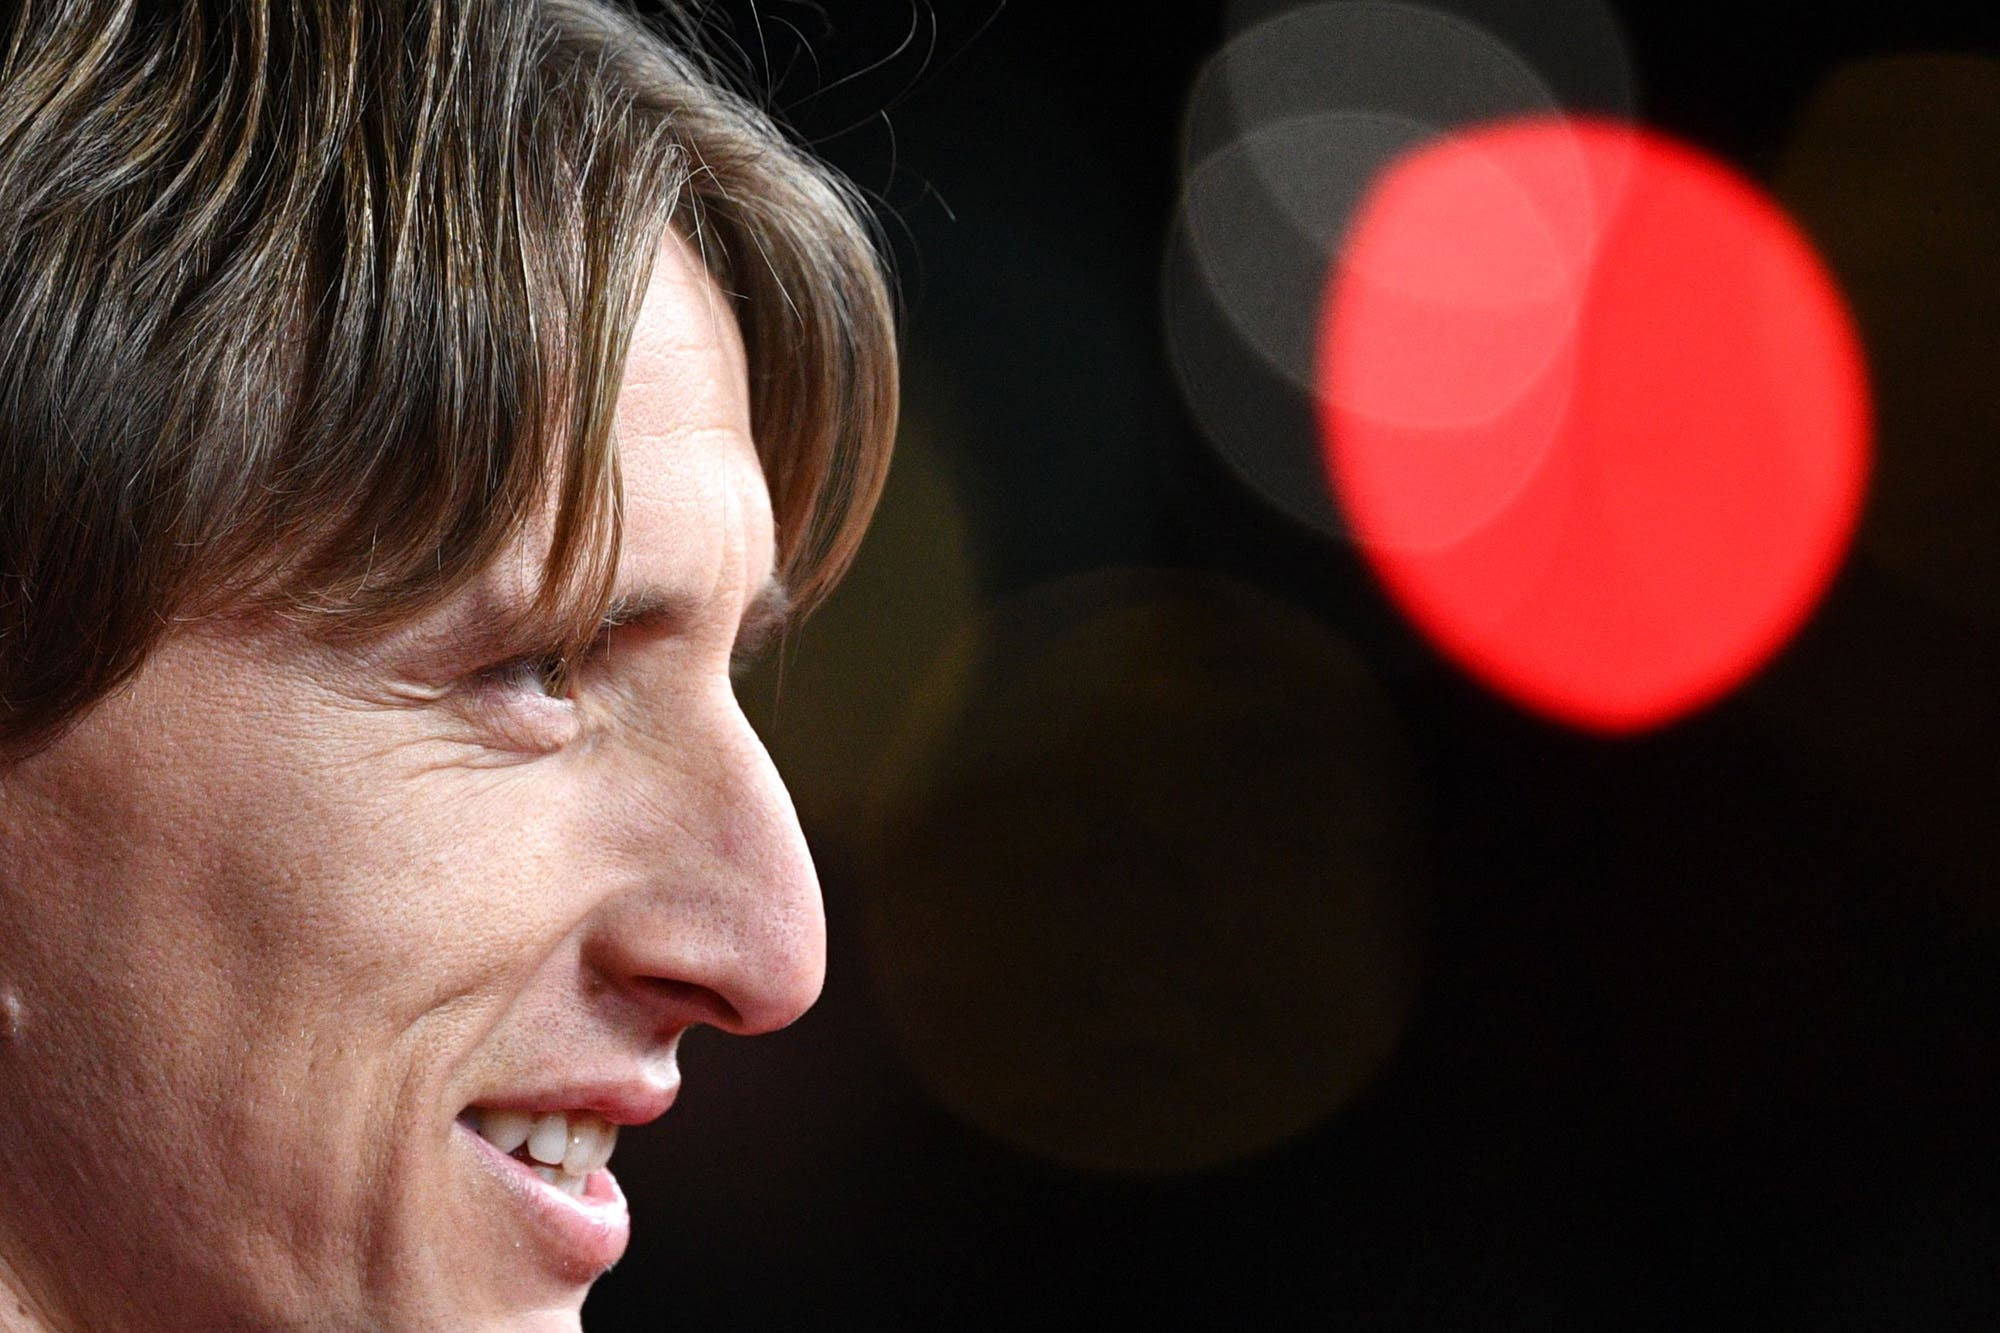 Balón de Oro 2019: la crítica de Luka Modric a Cristiano Ronaldo por no ir a la gala